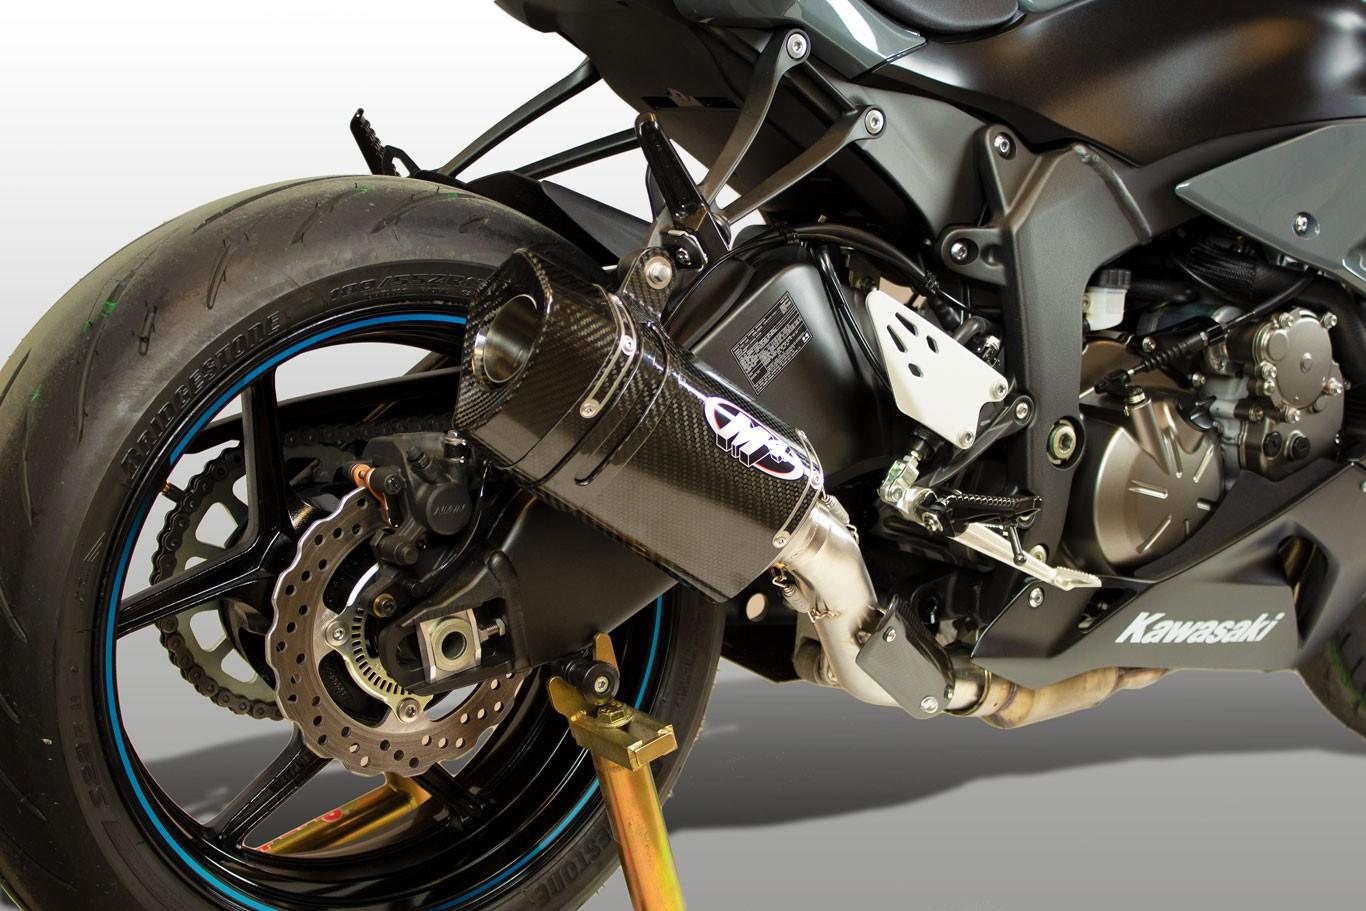 M4 Tech 1 Carbon Fiber Slip On 2009 2019 Kawasaki Ninja Zx 6r Ka6934